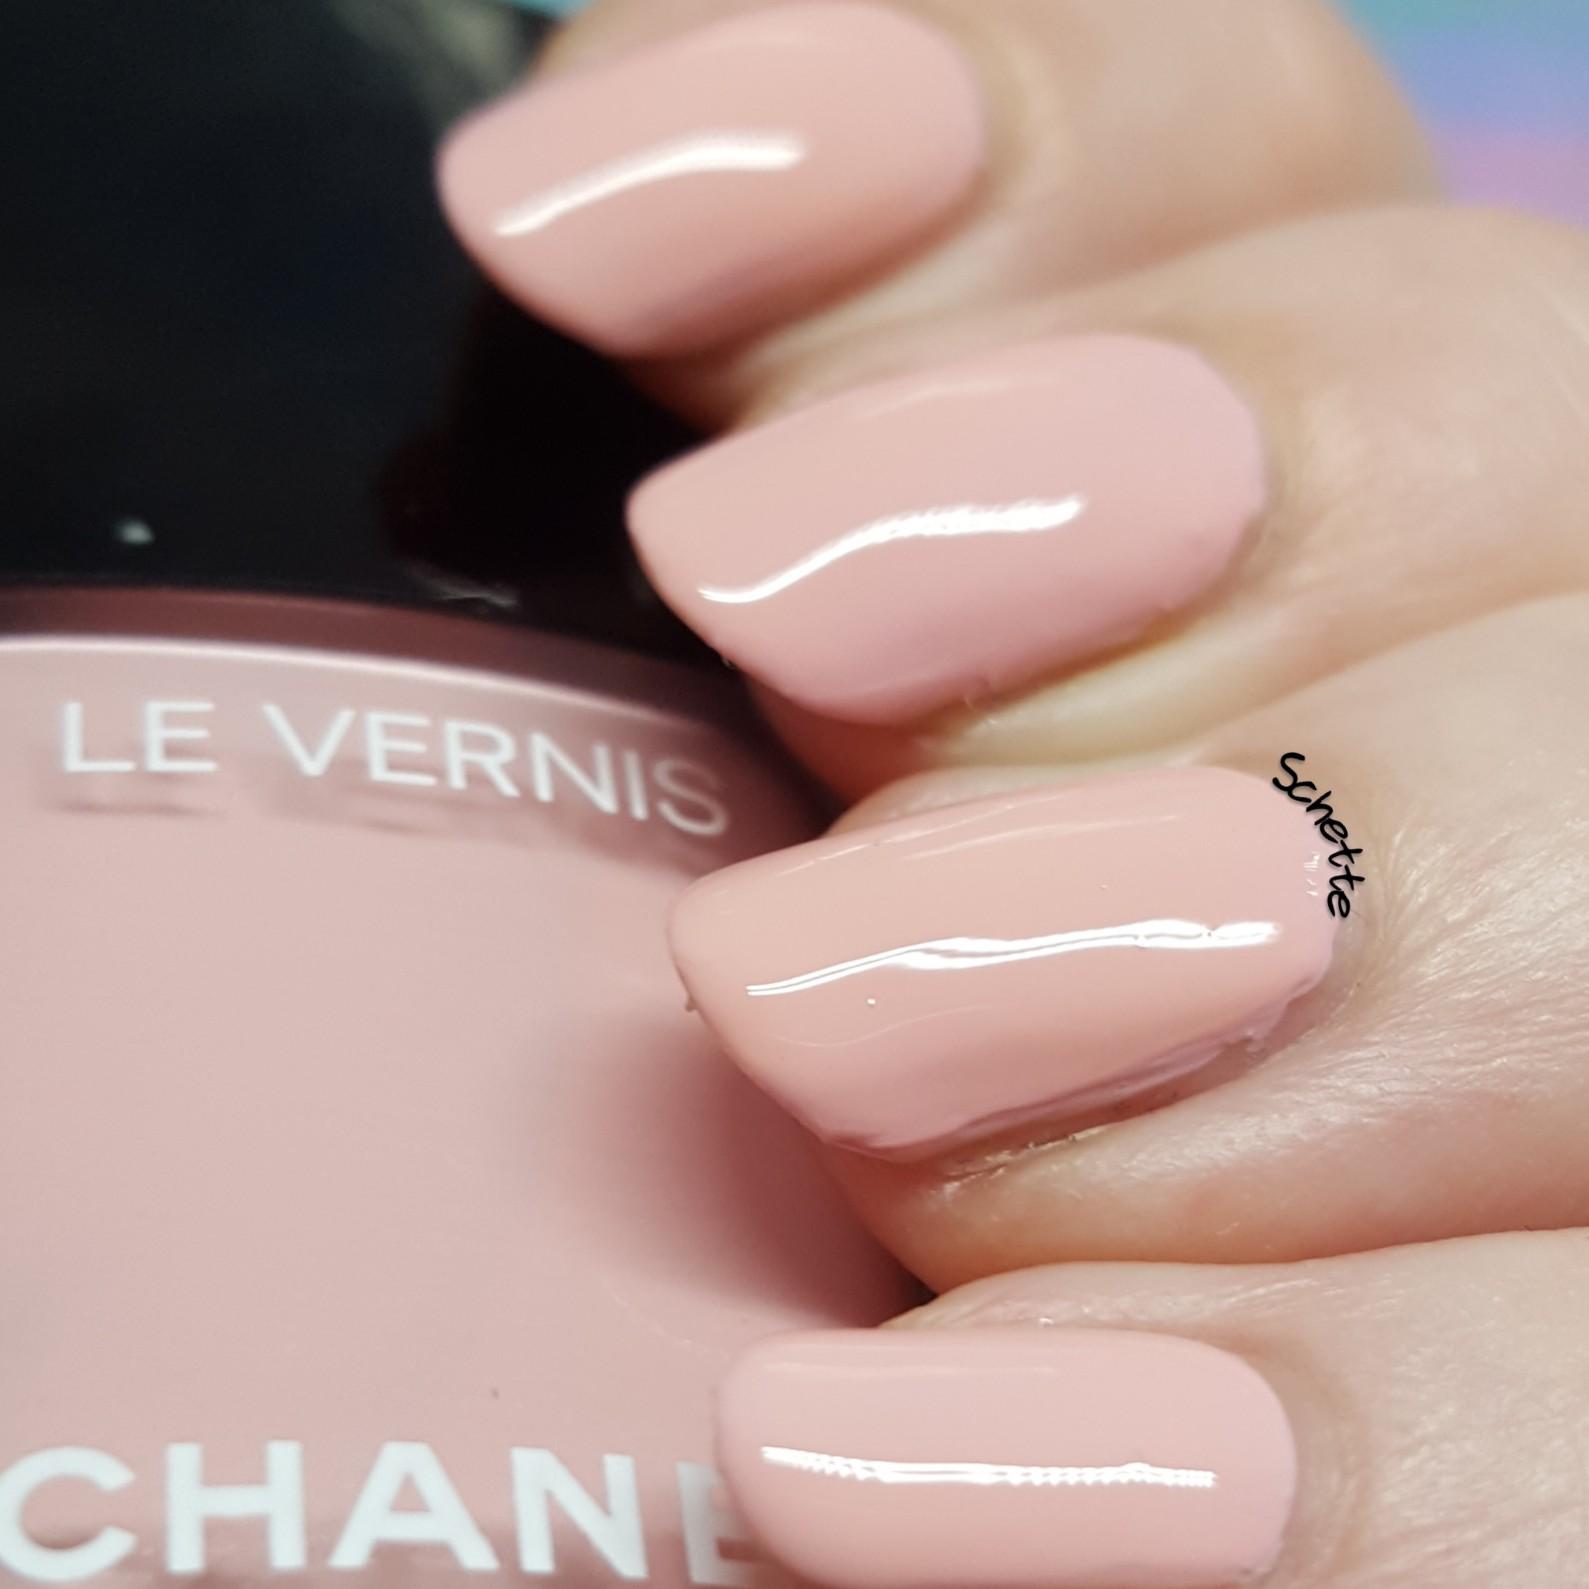 Chanel - Nuvola Rosa